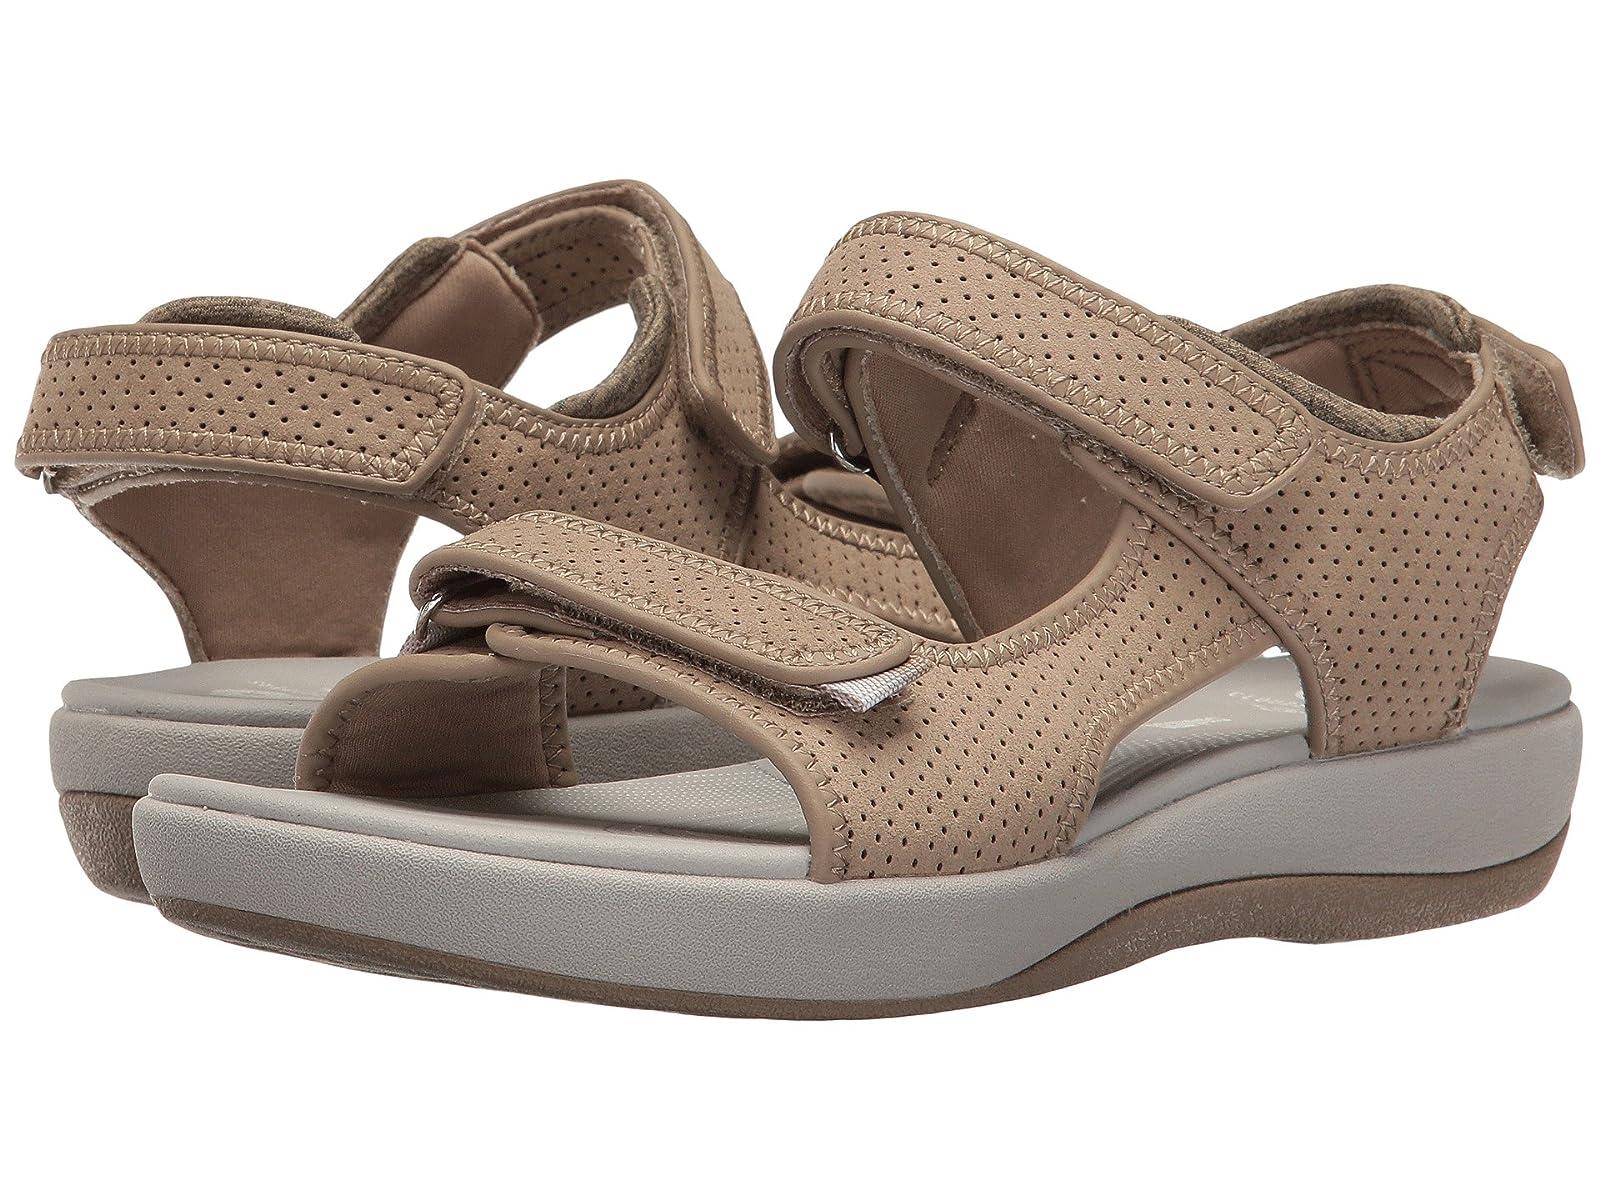 Clarks Brizo SammieComfortable and distinctive shoes